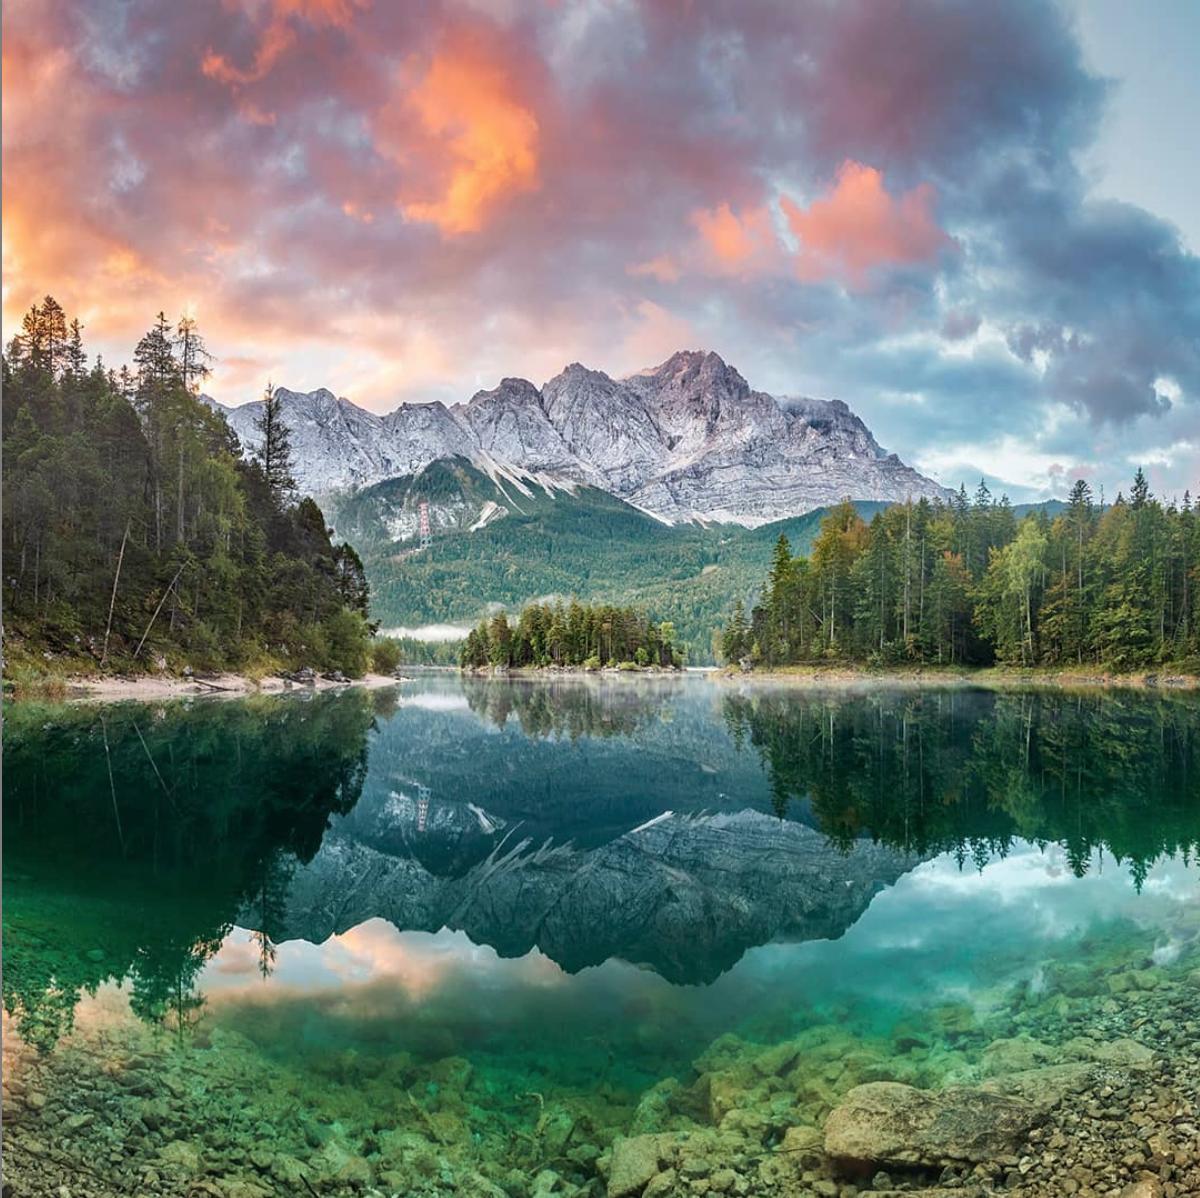 Germany Austria High Peaks Of The Bavarian Tyrol Hiking Tour Scenic Lakes Hiking Tours Scenic